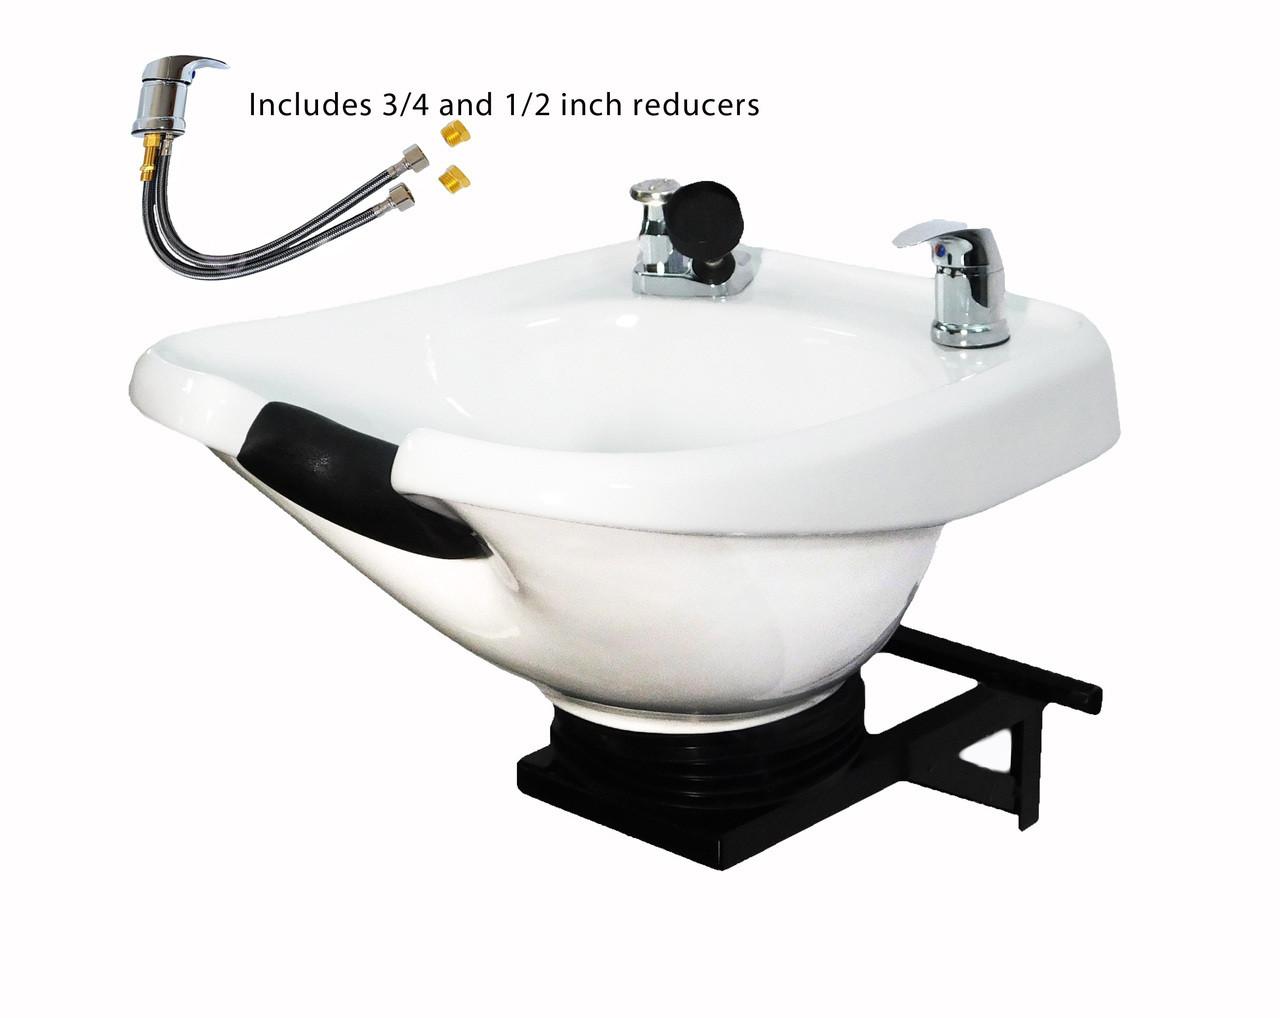 Salon Shampoo White CERAMIC Tilt Bowl Wall Mounted Beauty Salon Equipment TLC-W33-WT